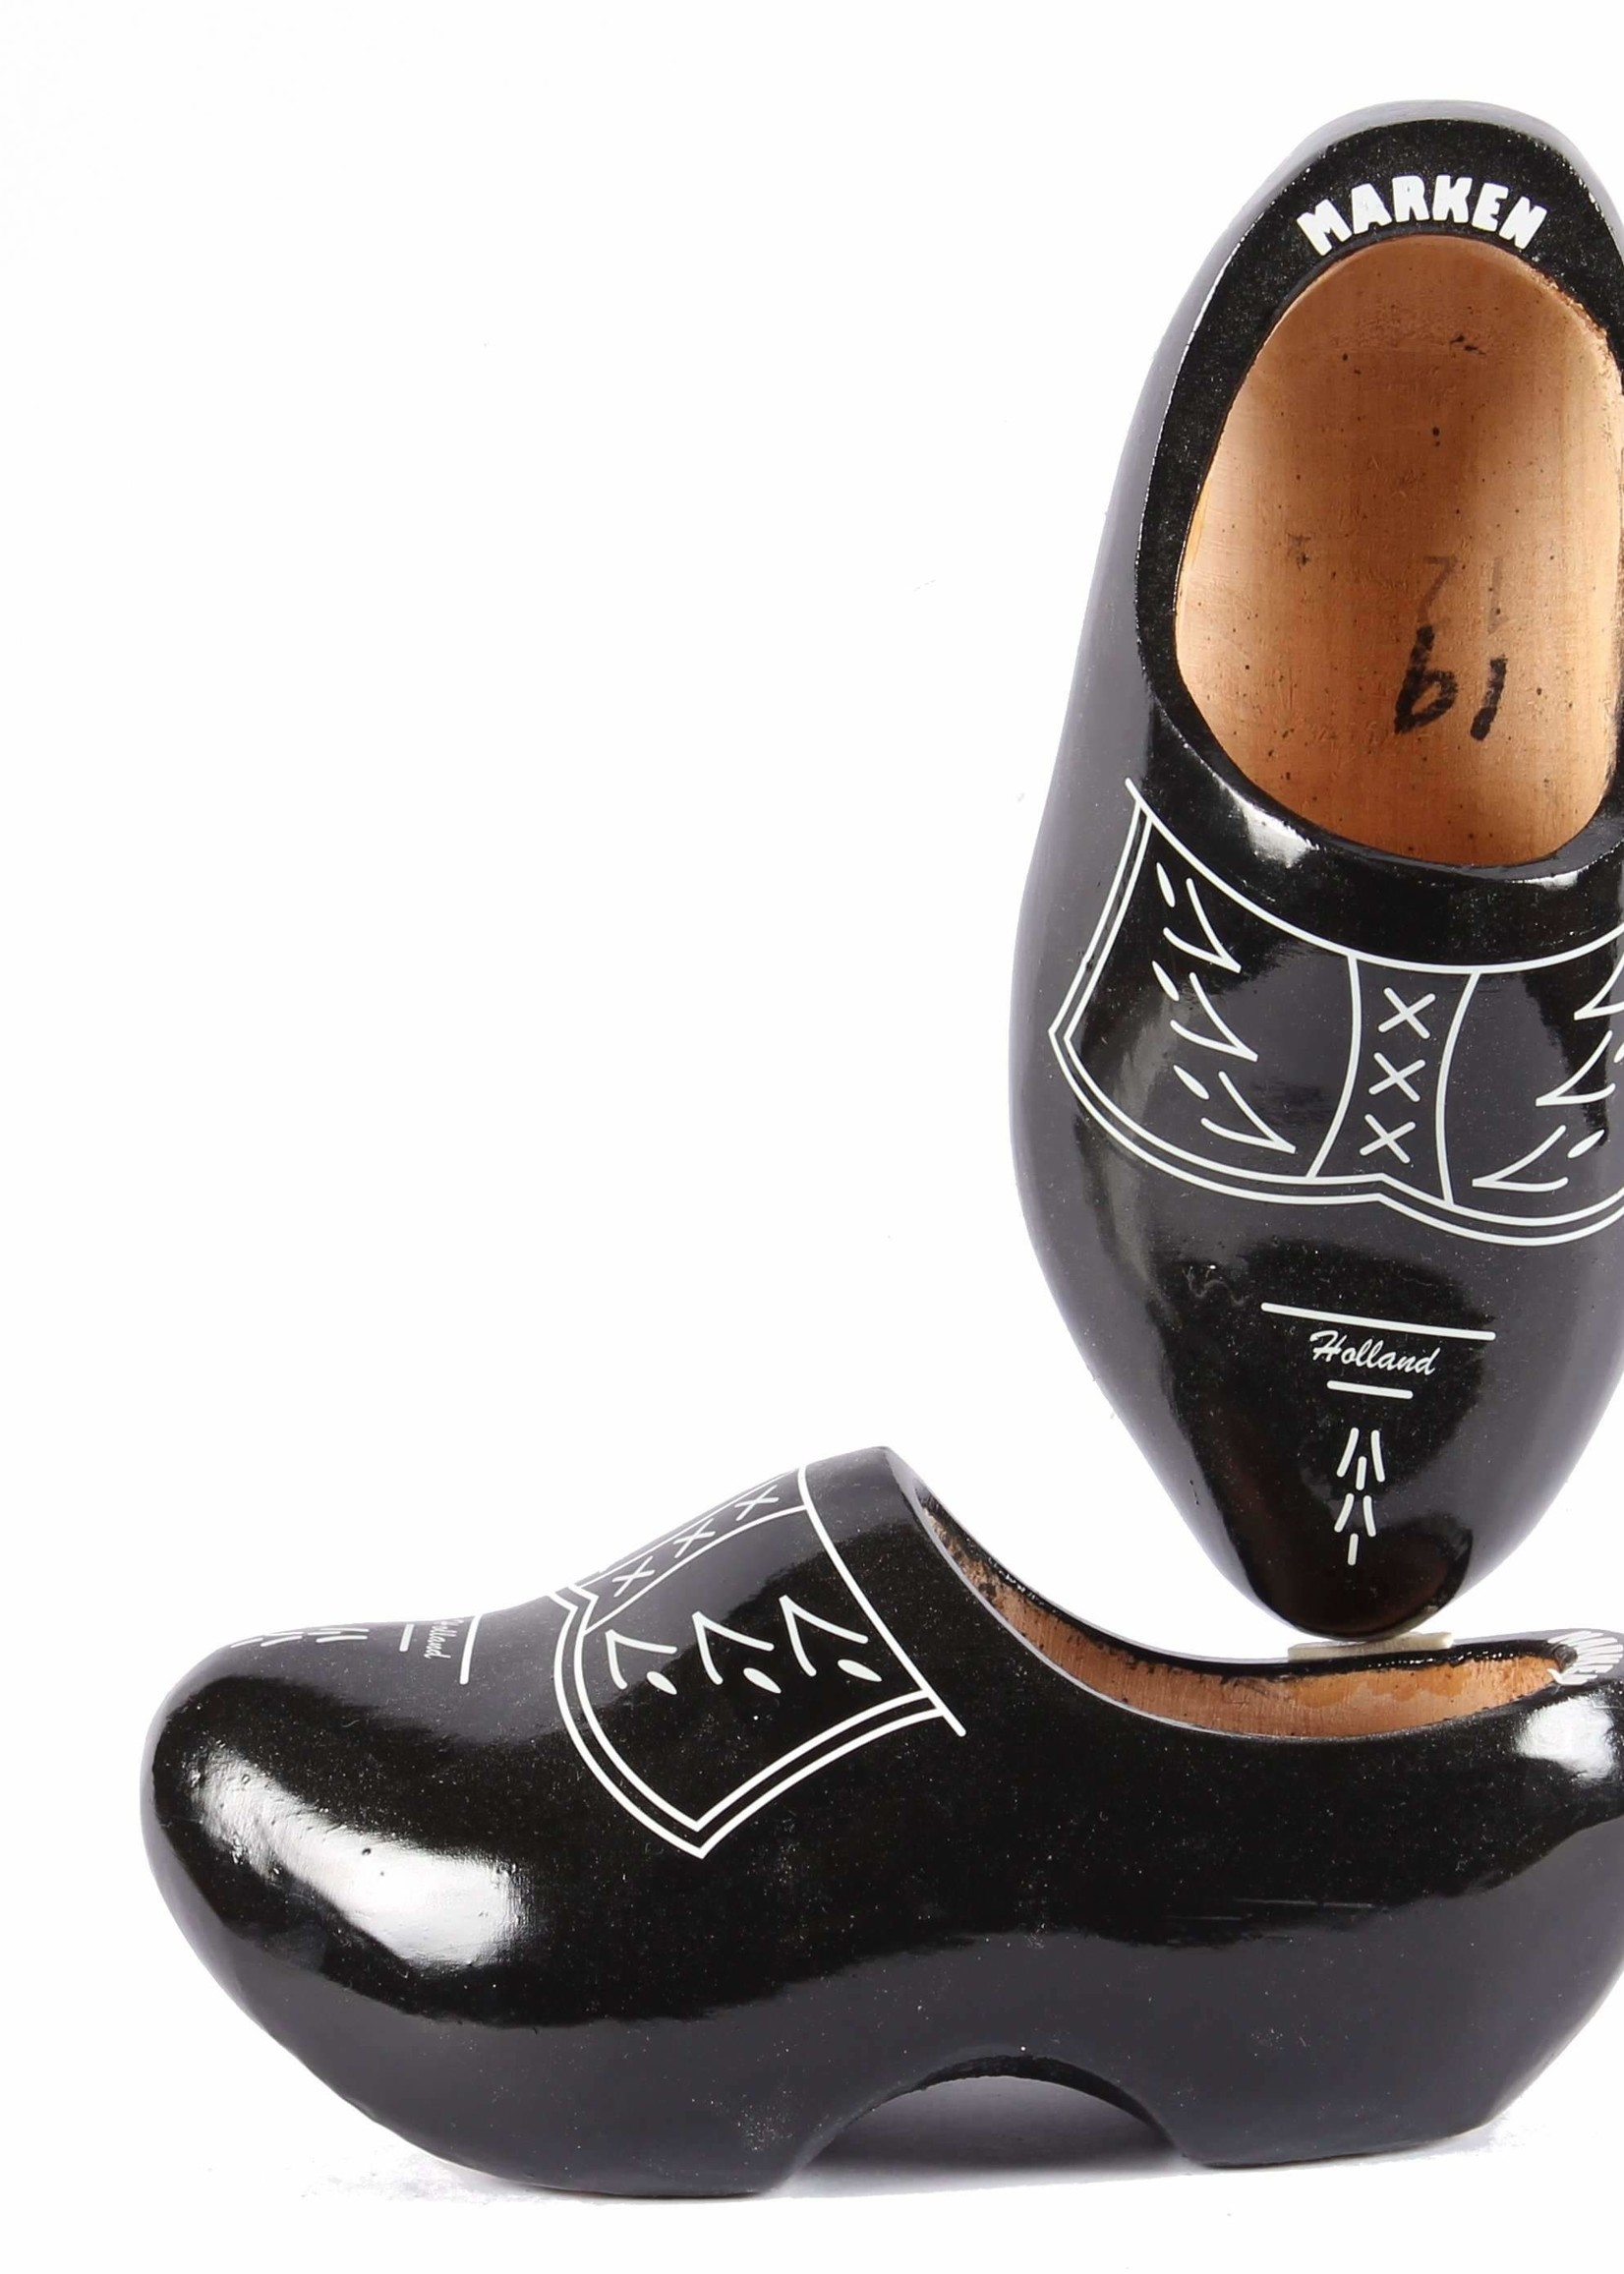 Wooden Shoe Factory Marken Wooden Shoes Traditional Black